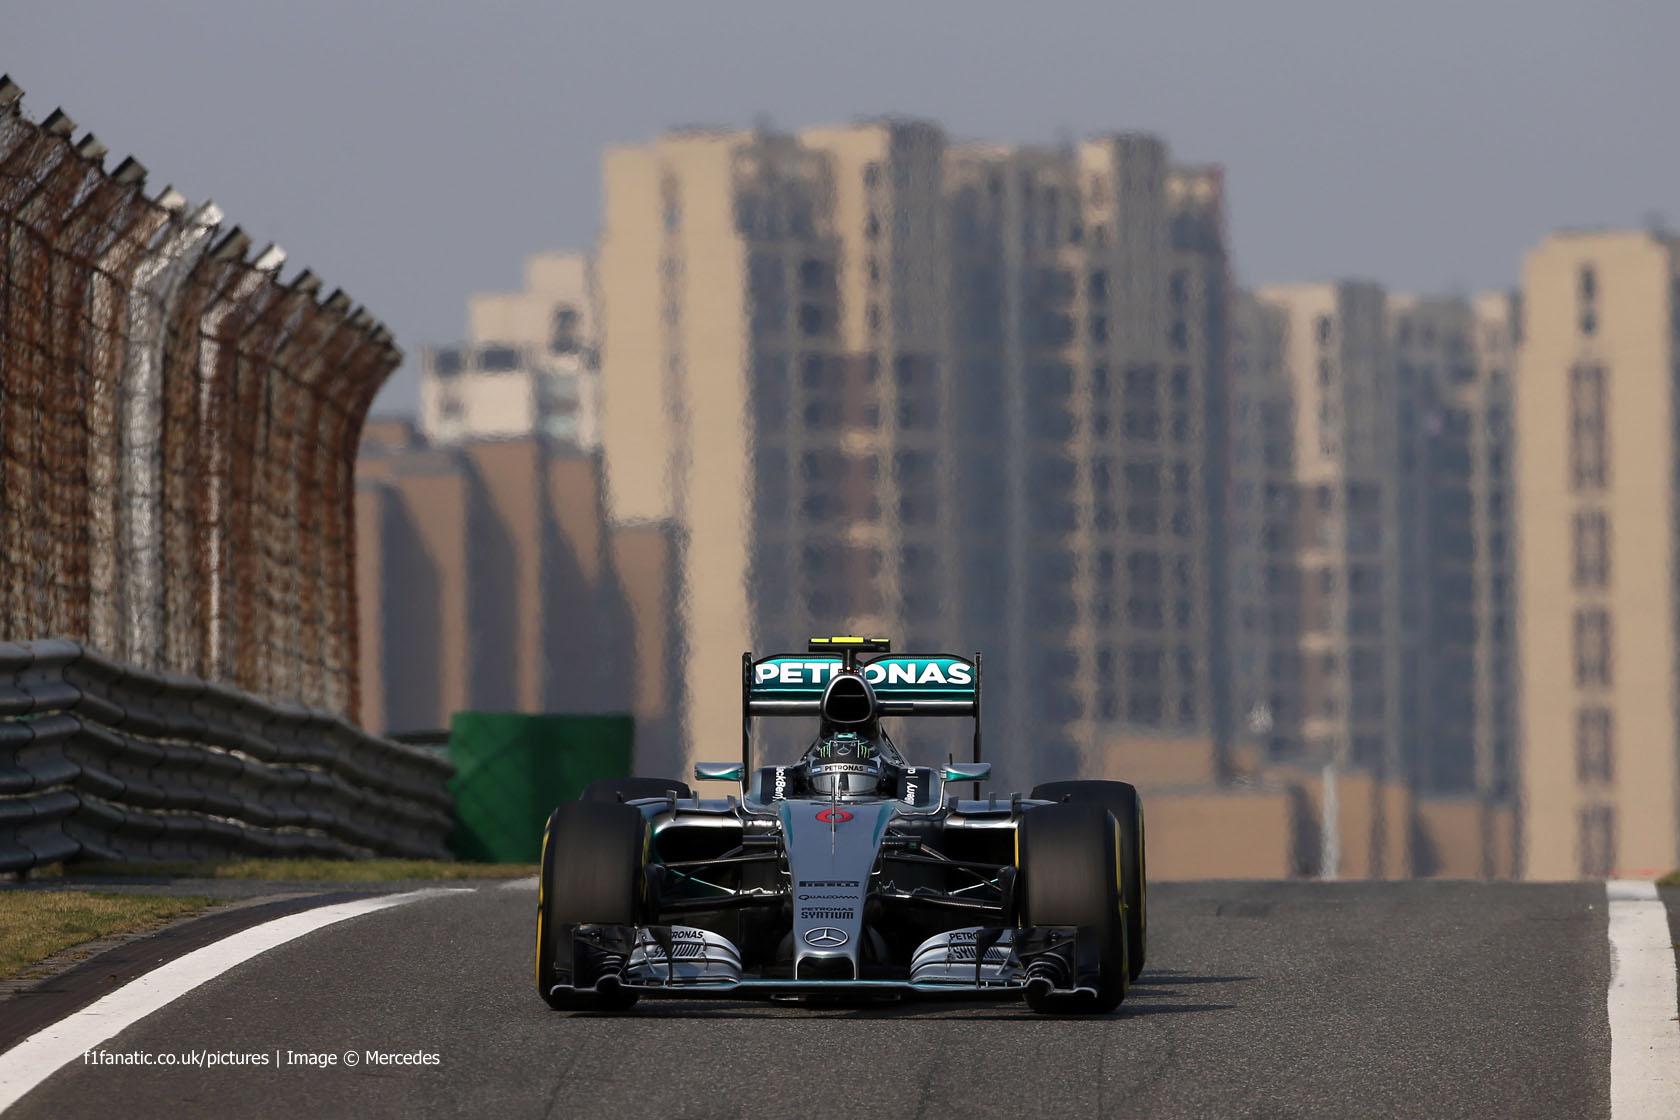 Nico Rosberg, Mercedes, Shanghai International Circuit, 2015